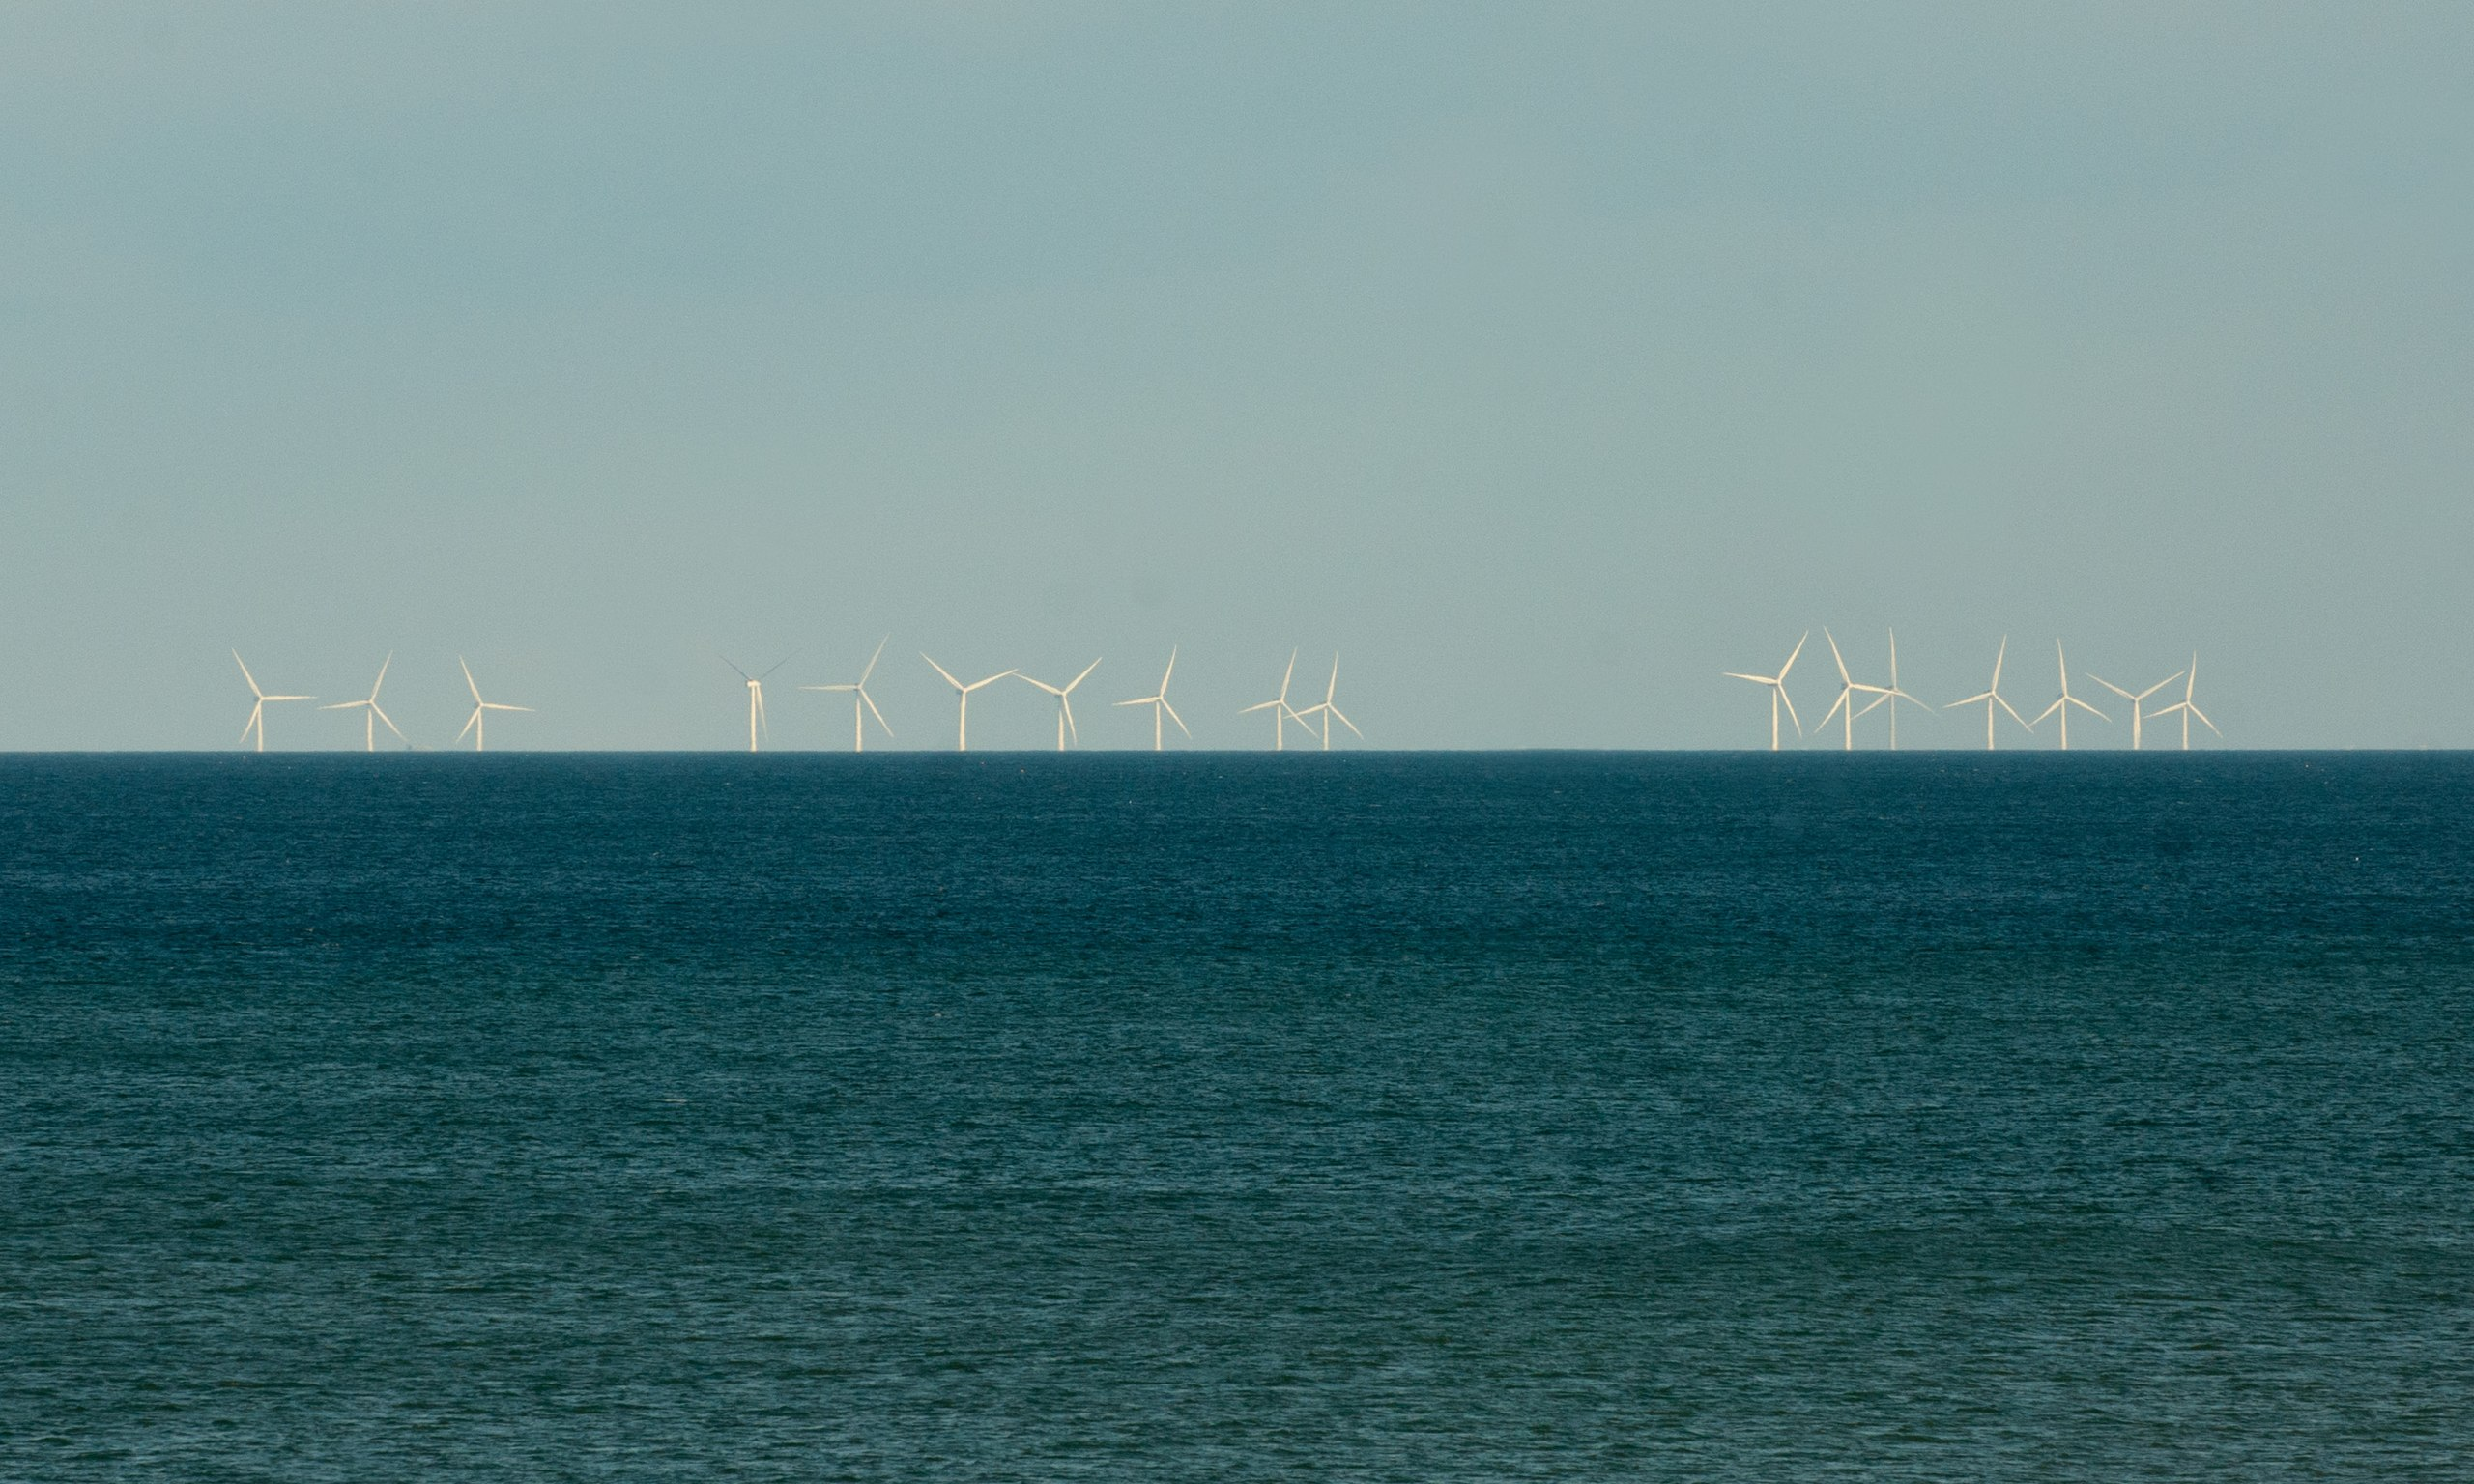 Hornsea vindfarm